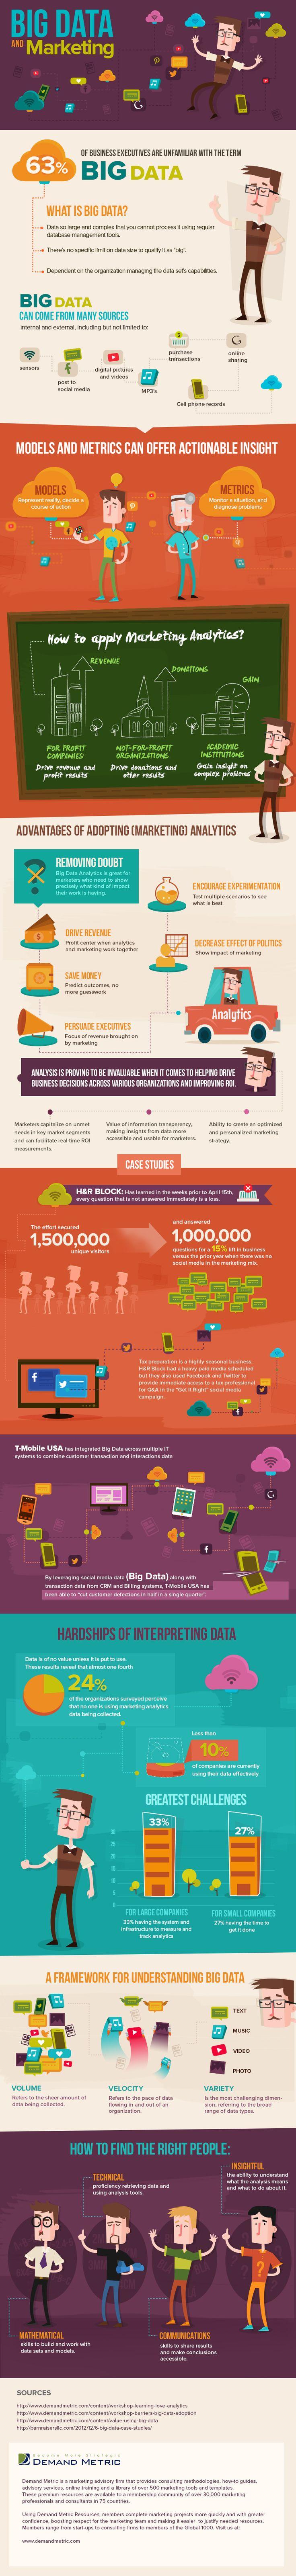 BIG DATA And Marketing #Infographic #marketing #BigData